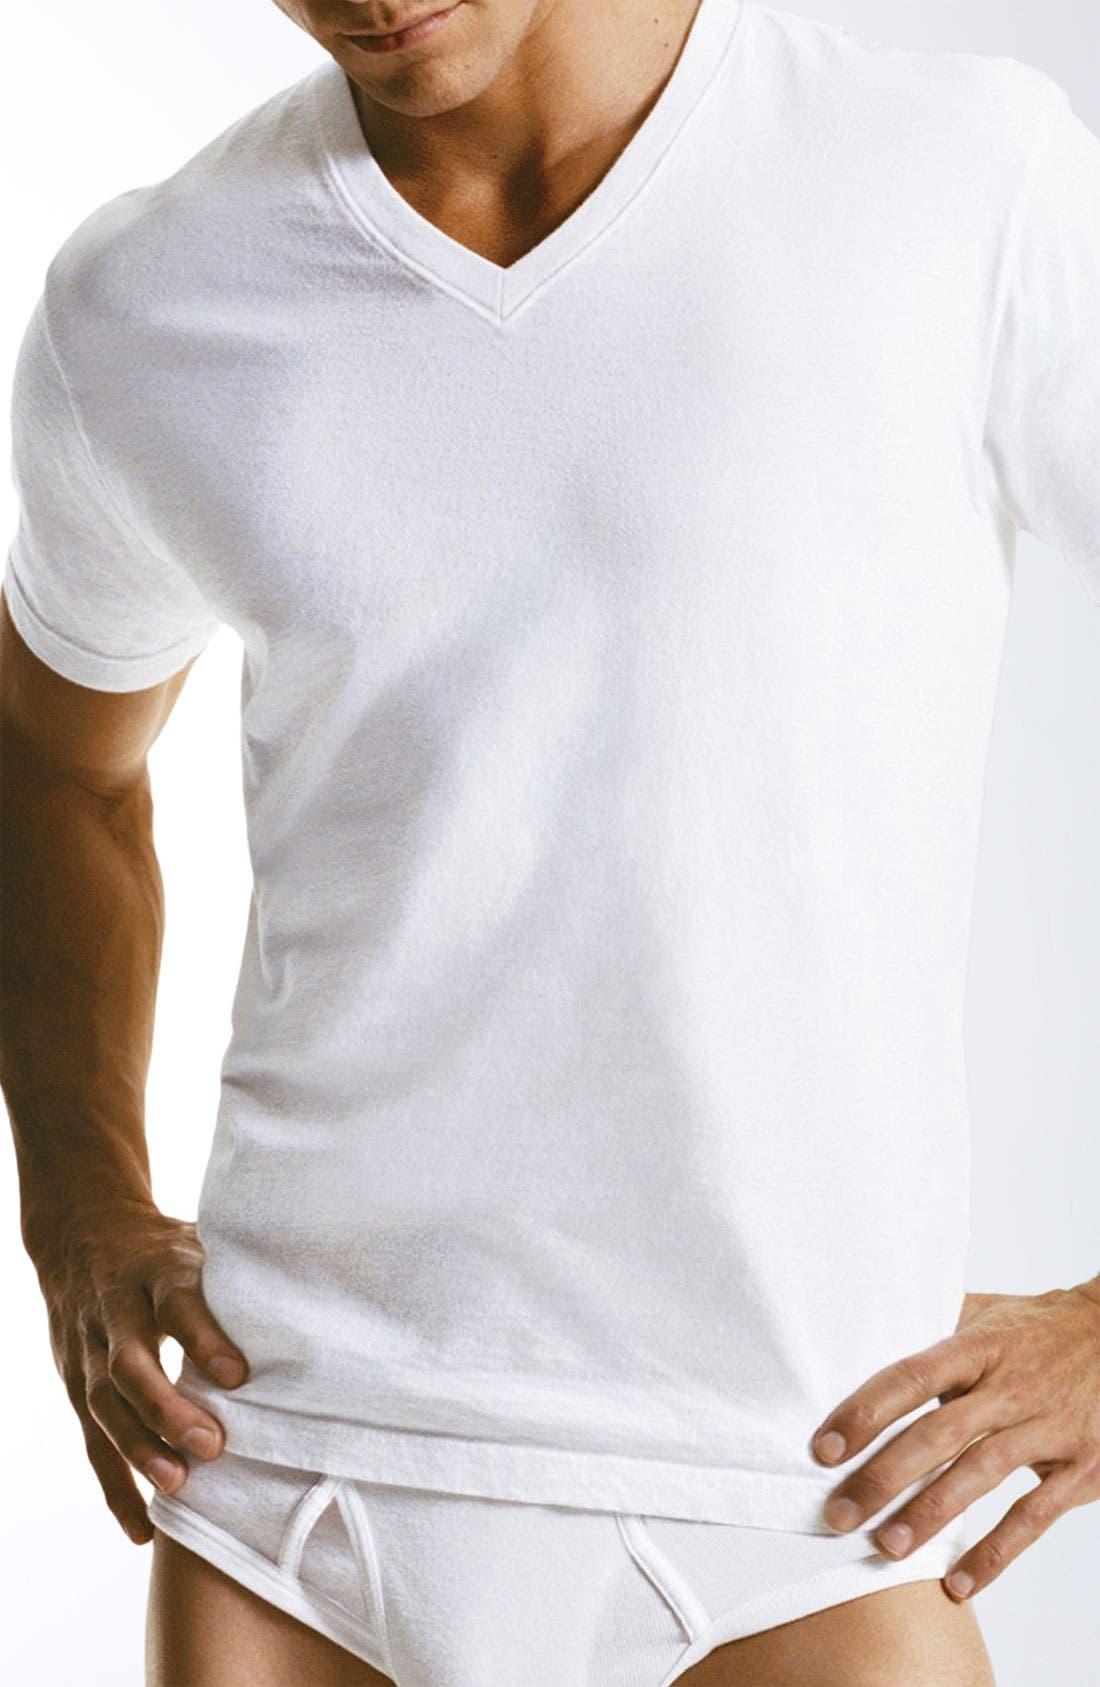 Main Image - Calvin Klein 'M9065' Cotton V-Neck T-Shirt (3-Pack)